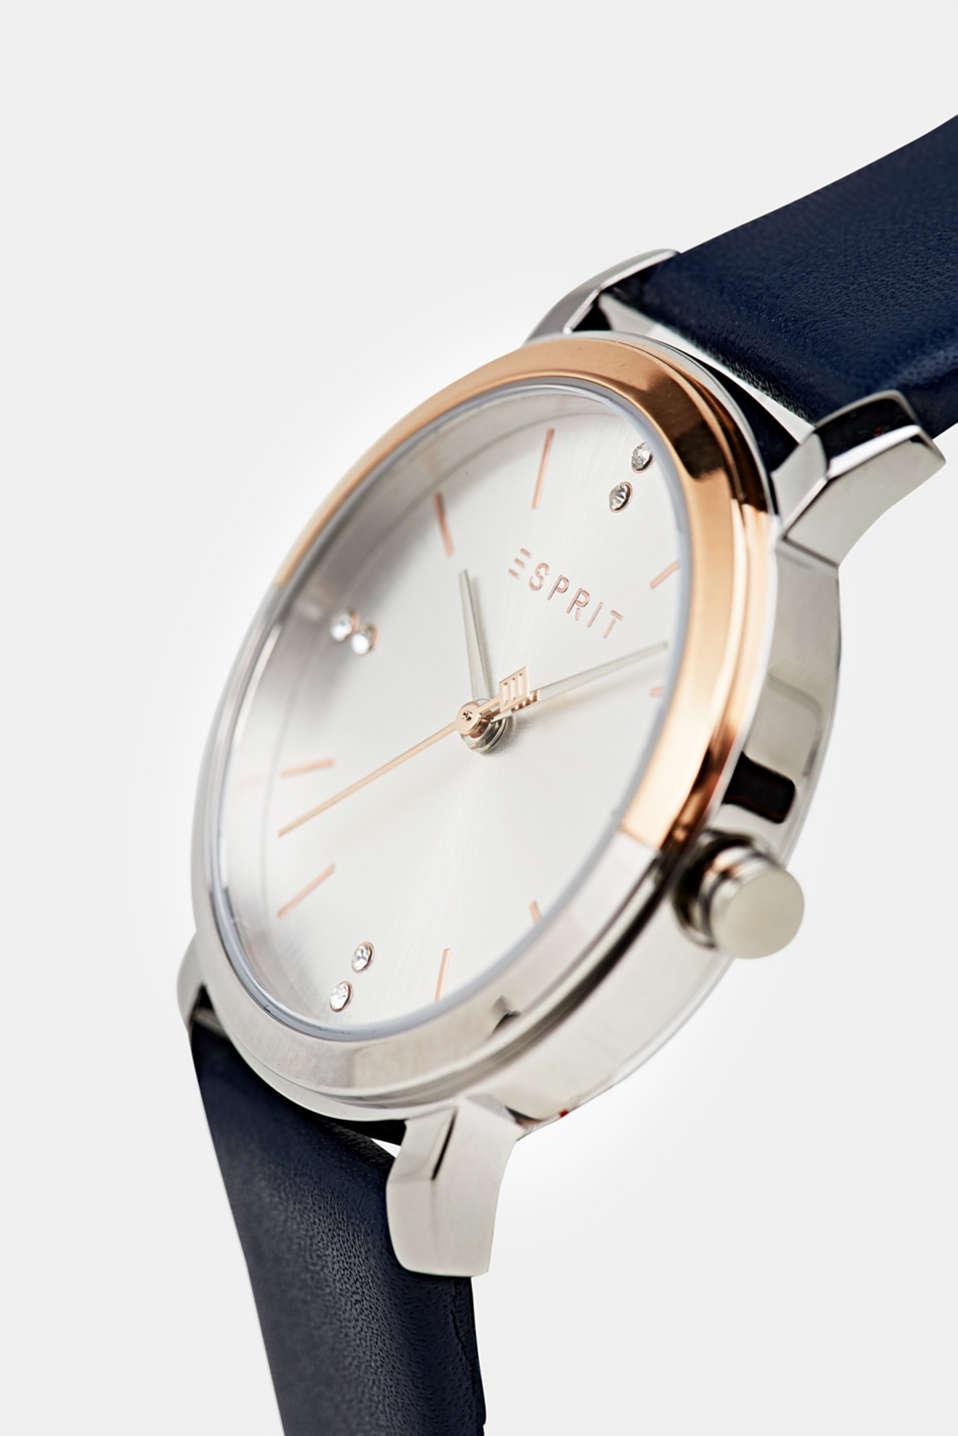 Watch and bracelet set, LCBLUE, detail image number 1